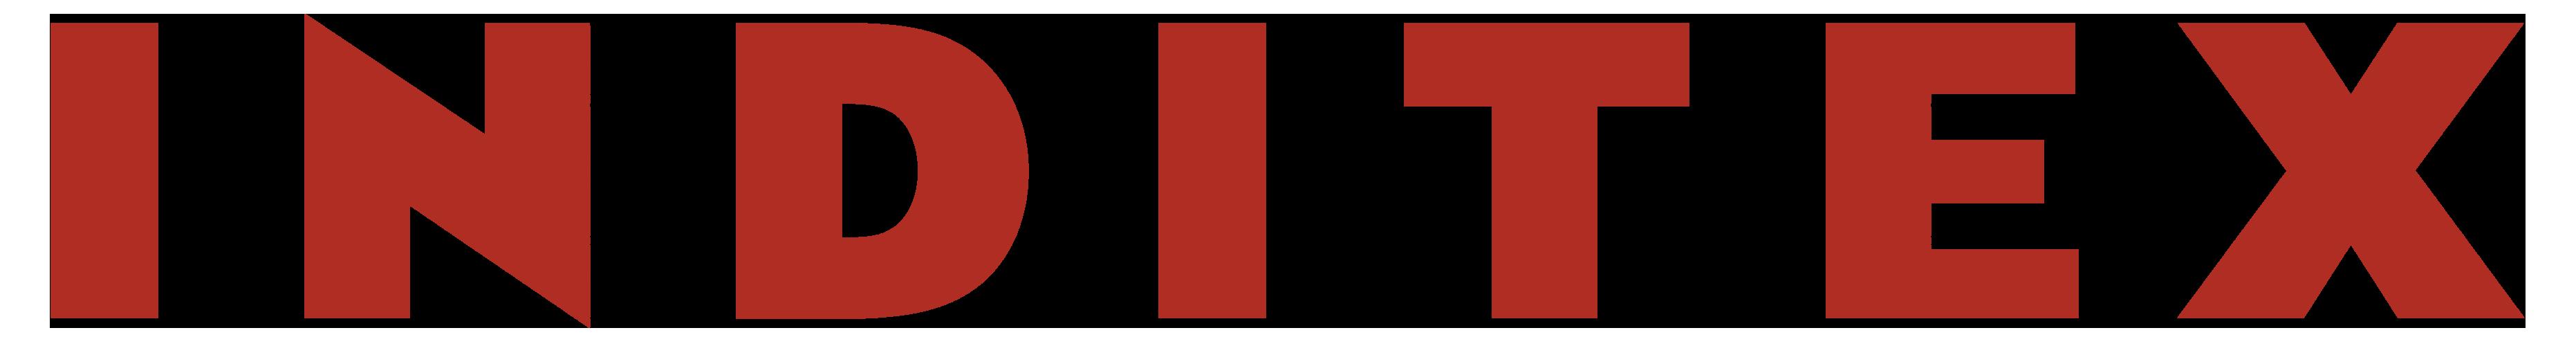 Inditex Logos Download